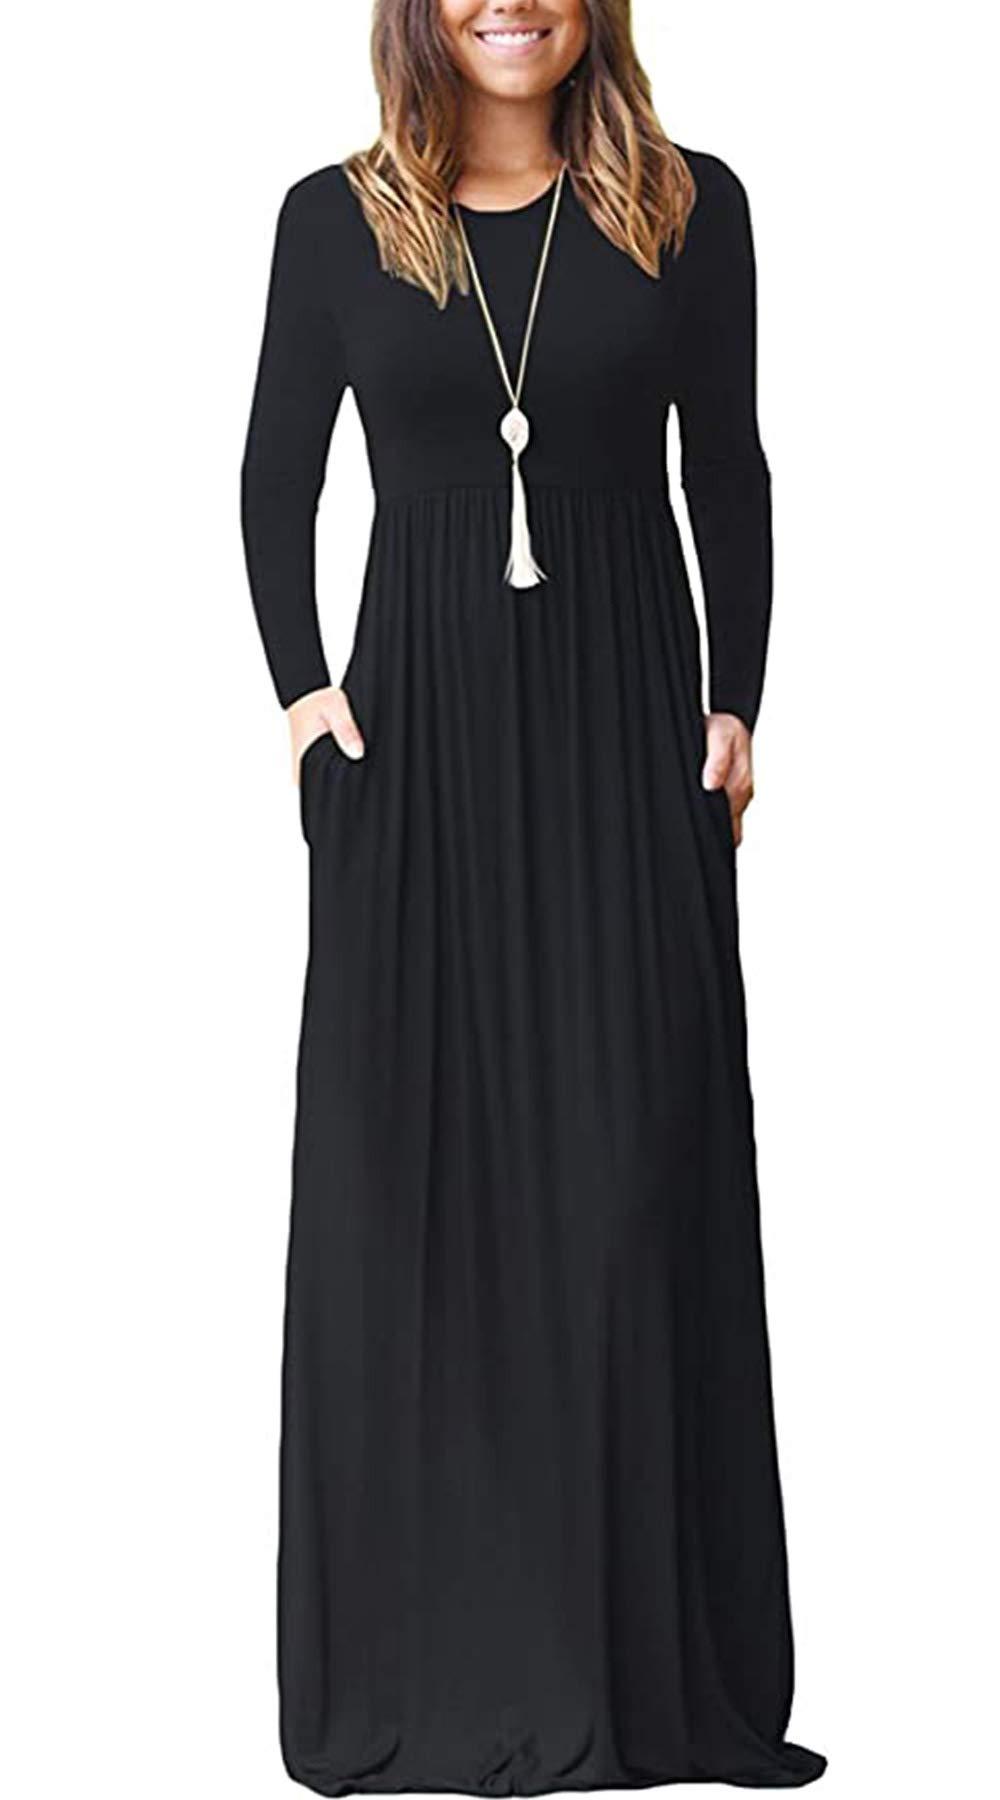 Sunzel Women Long/Short Sleeve Plain Maxi Dresses T Shirts Casual Dress with Pockets (Black - Long Sleeve Maxi, L)